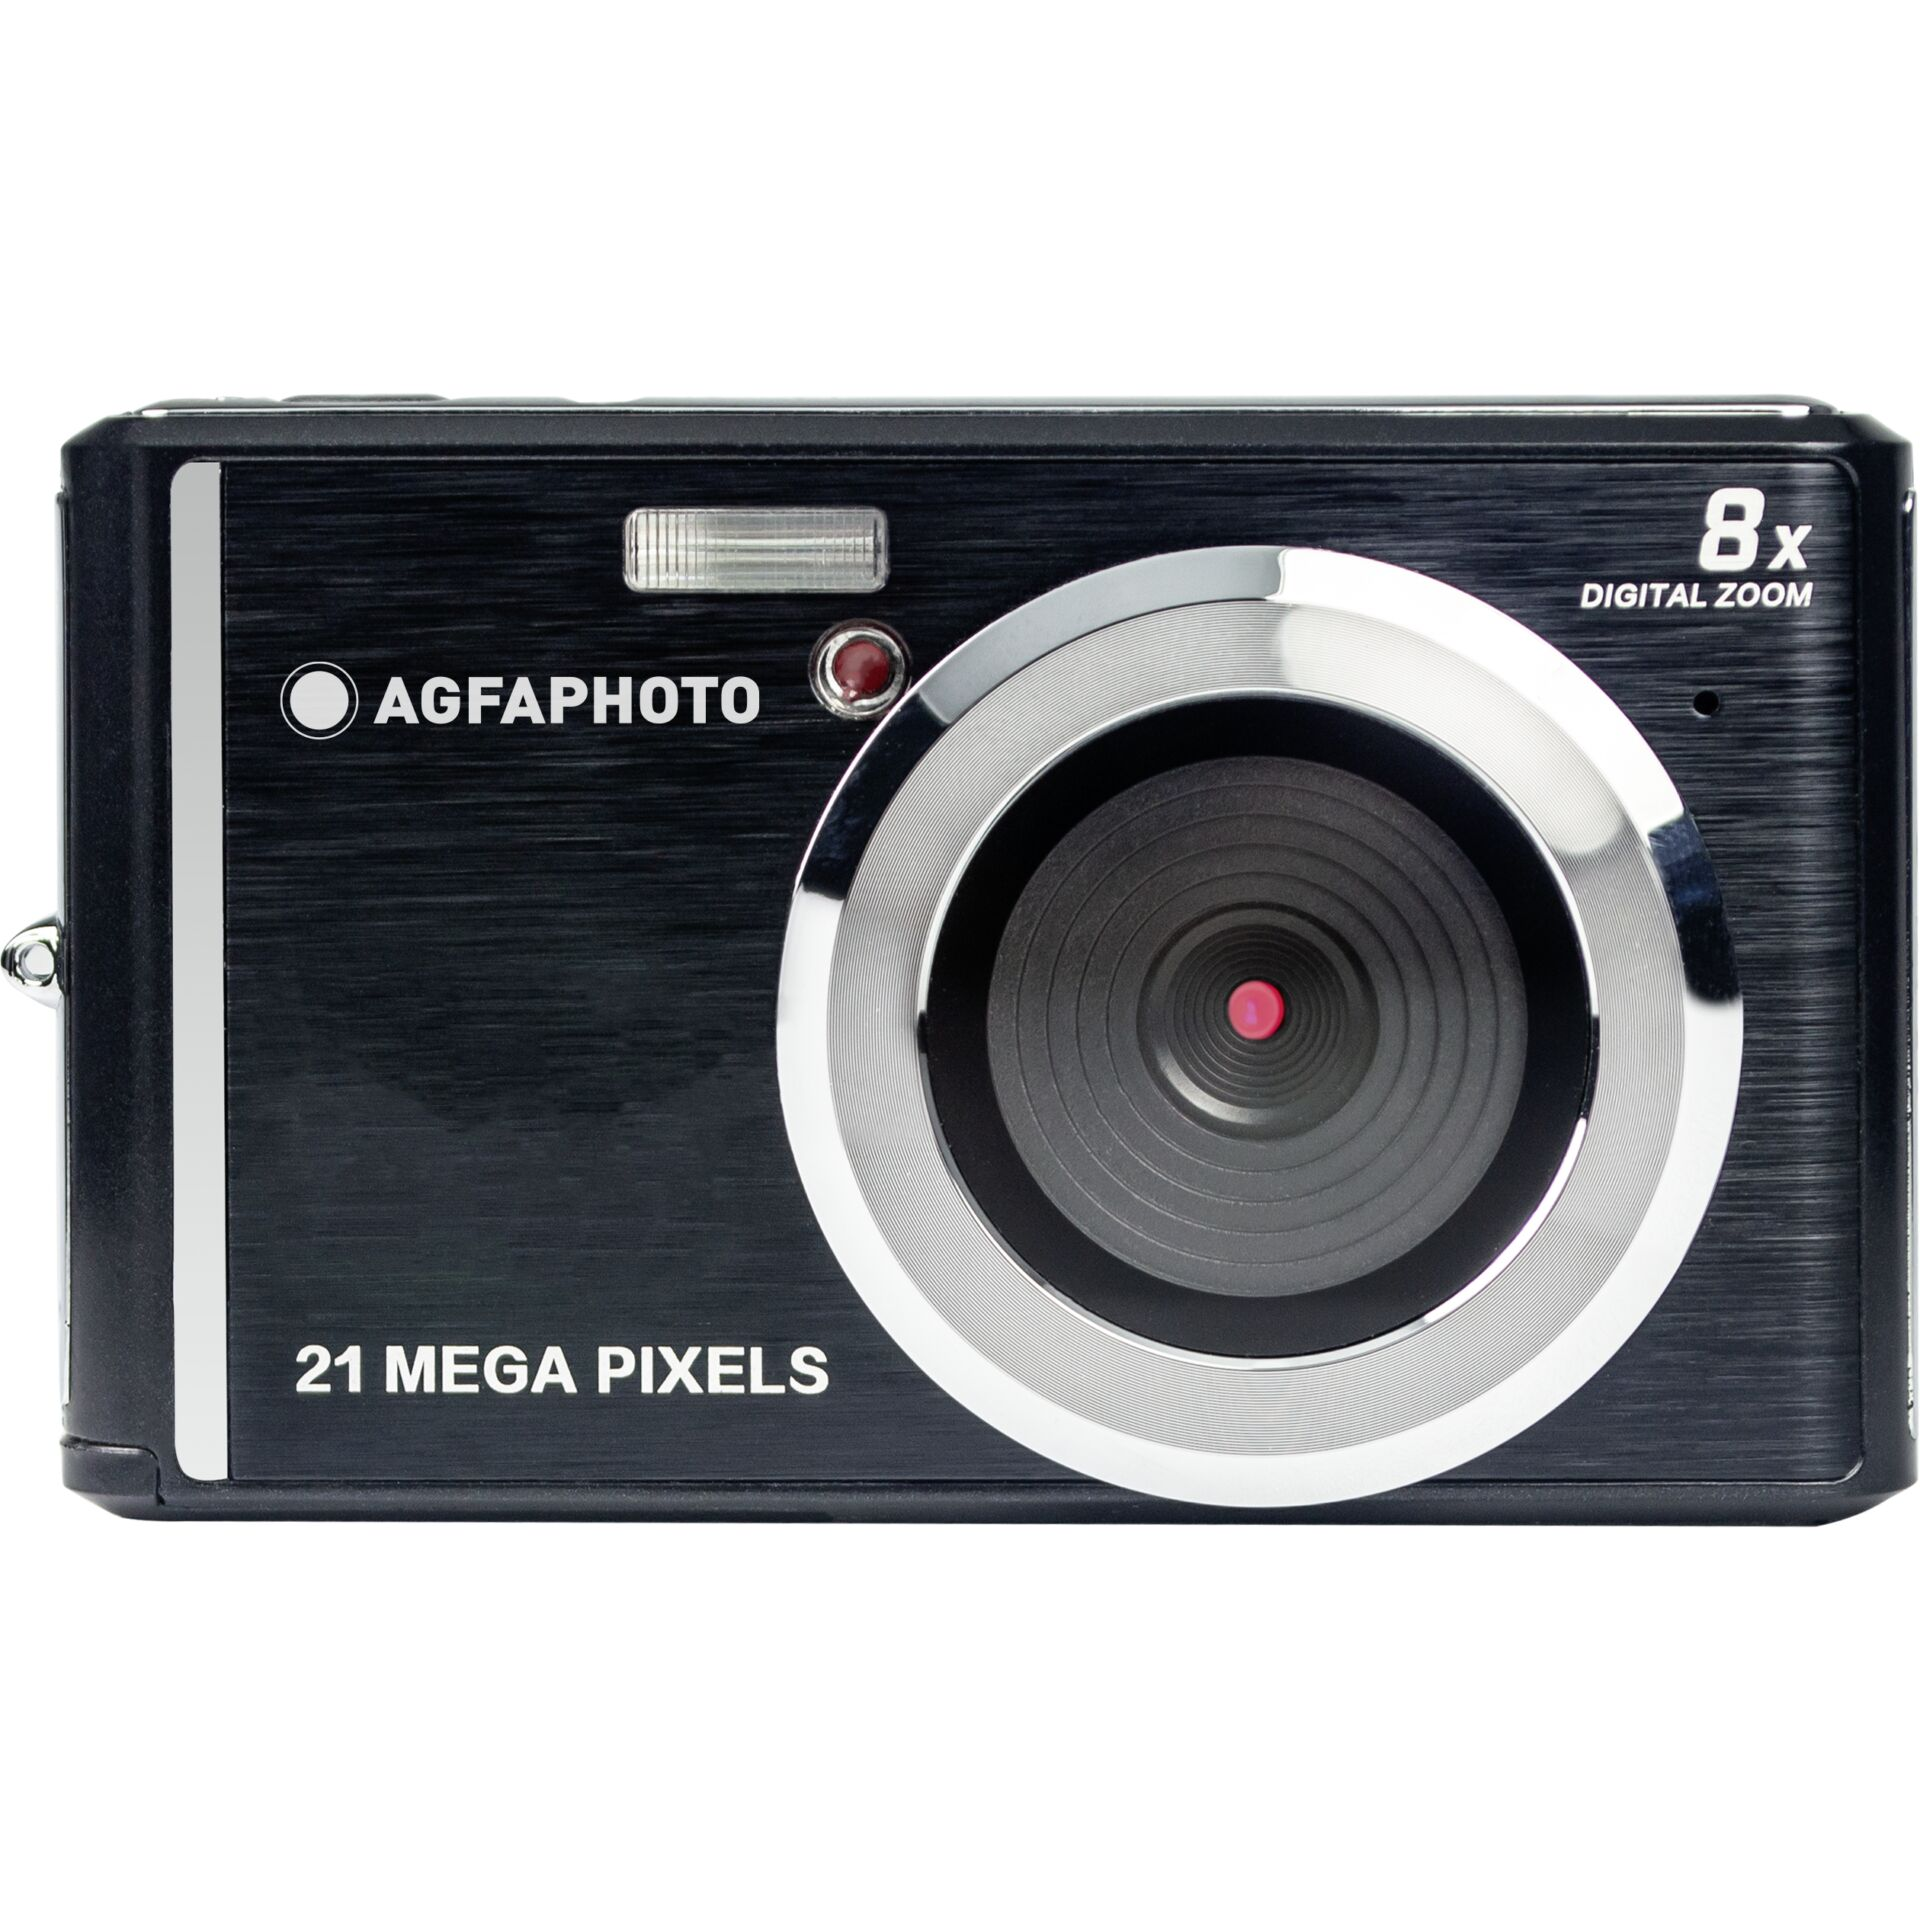 Agfa Compact Camera DC5200 black